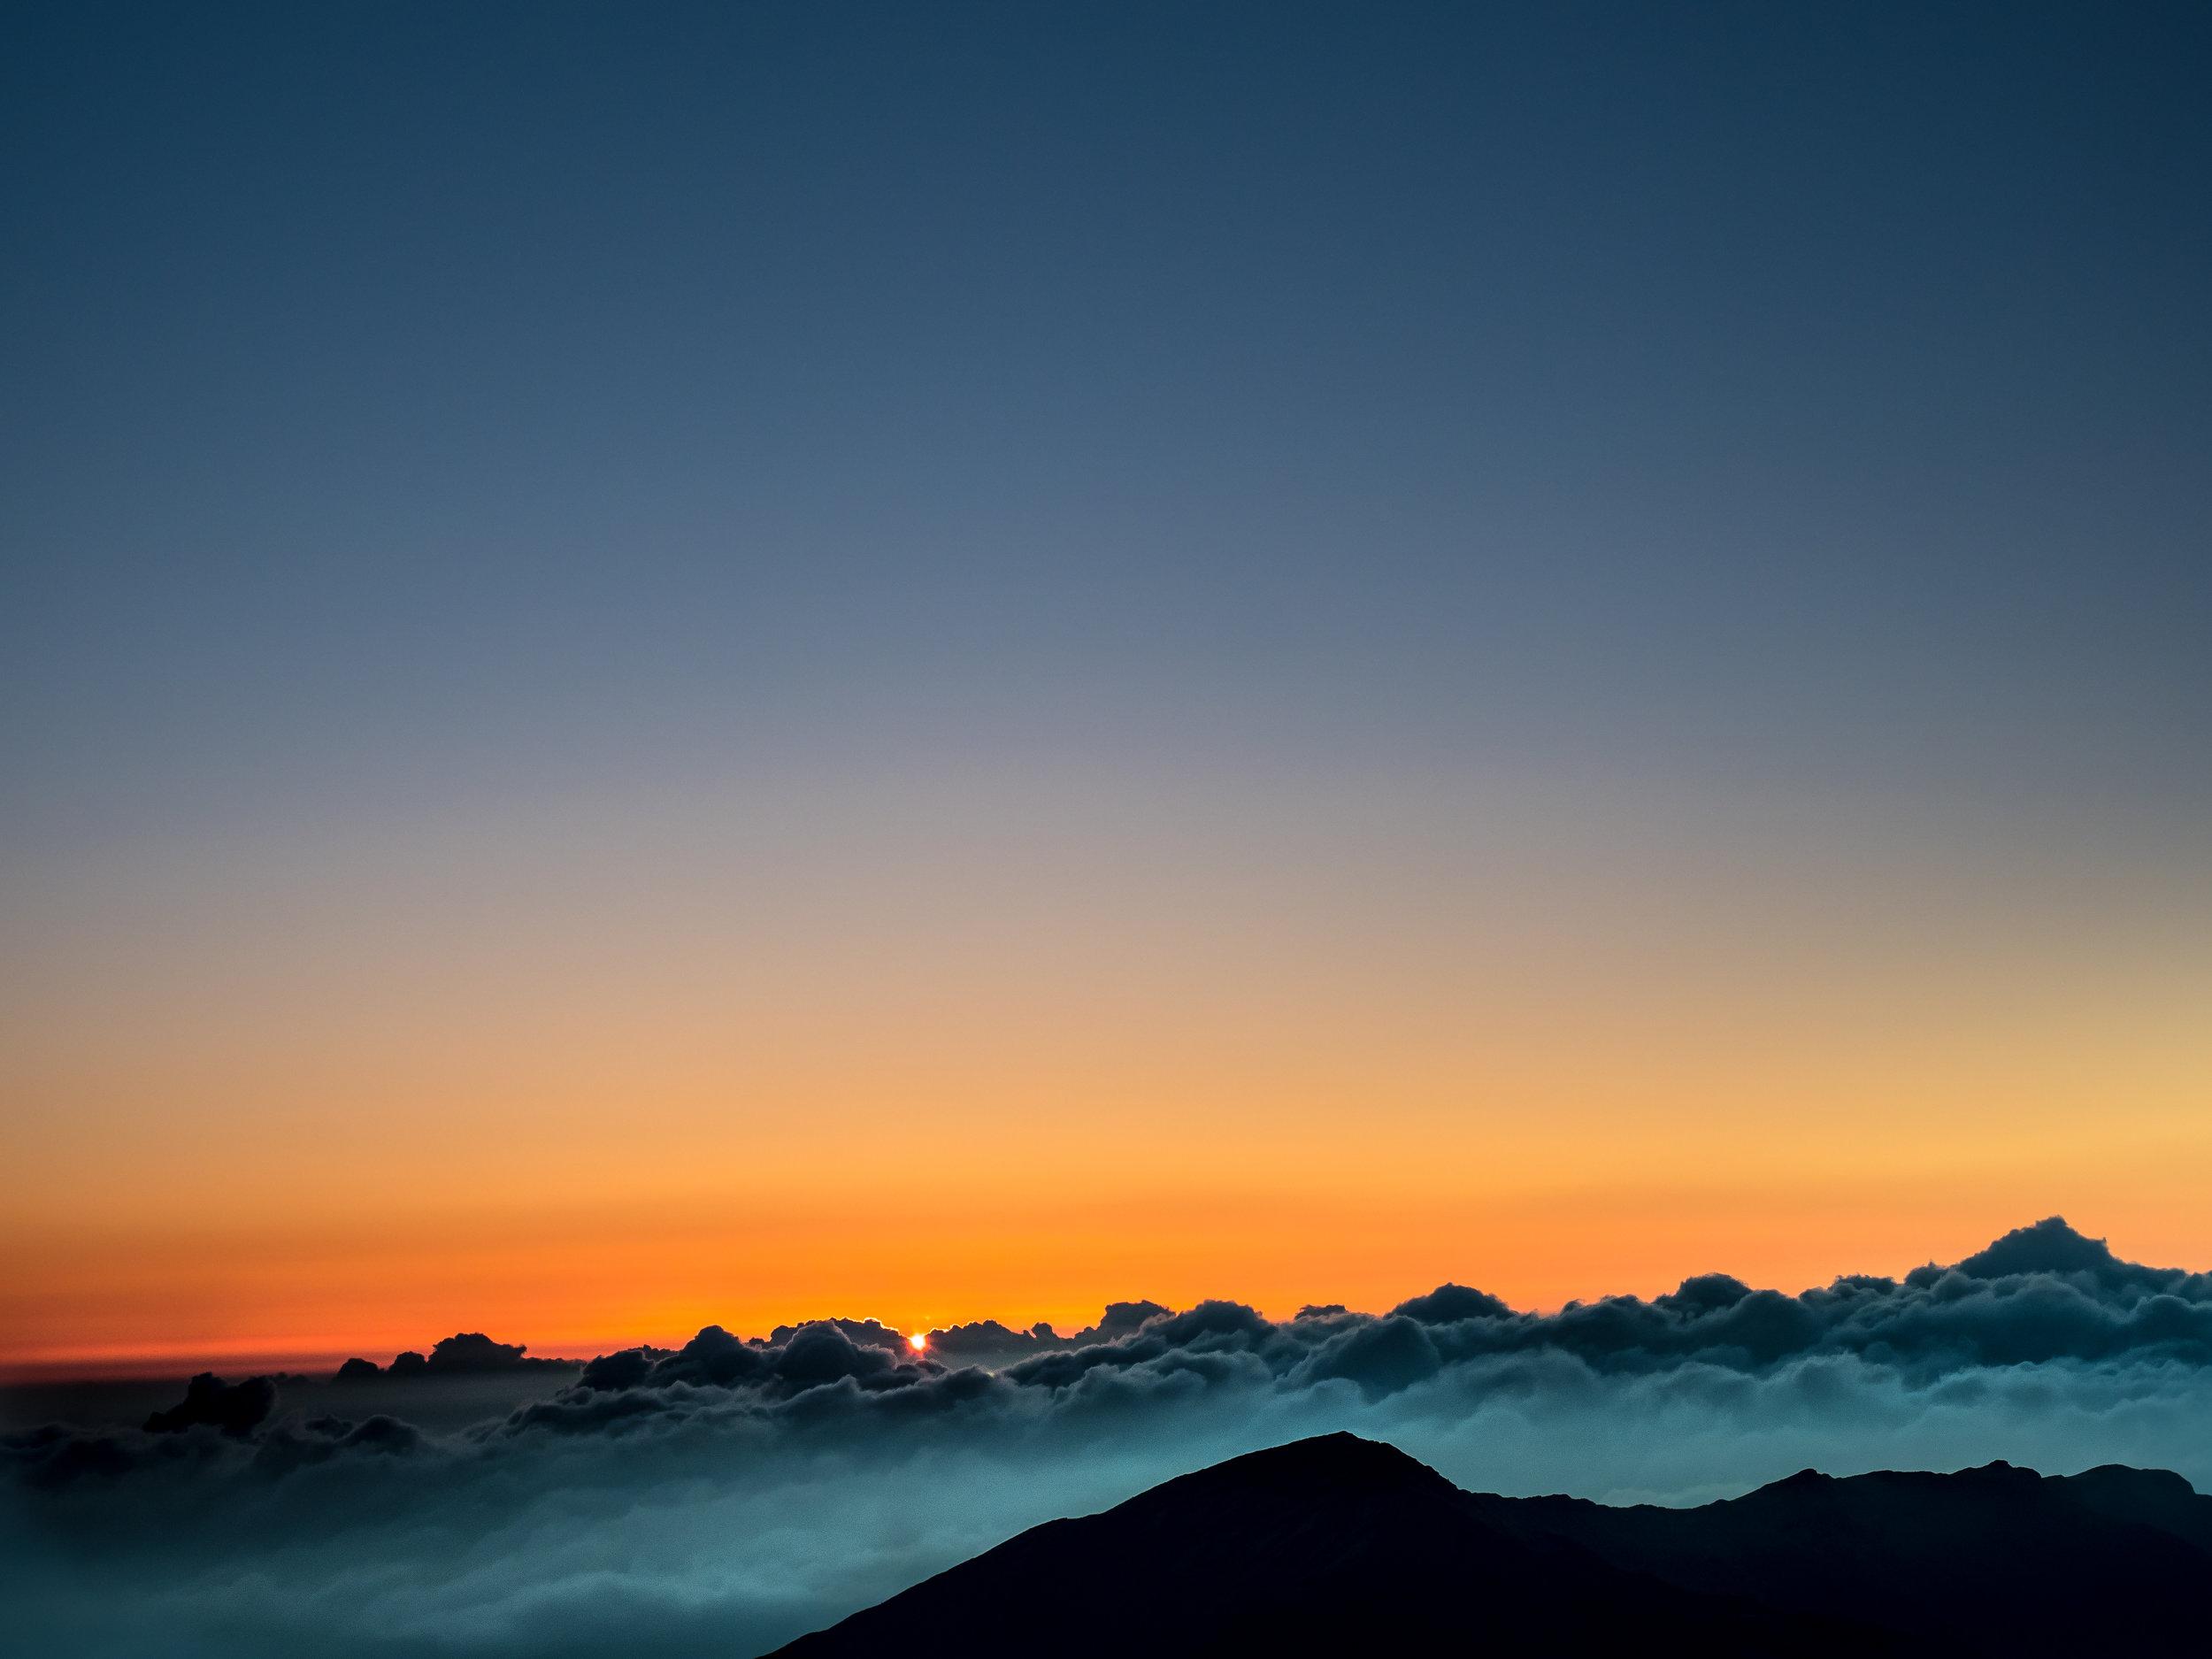 Haleakala Summit Maui Hawaii - Seth T. Buckley